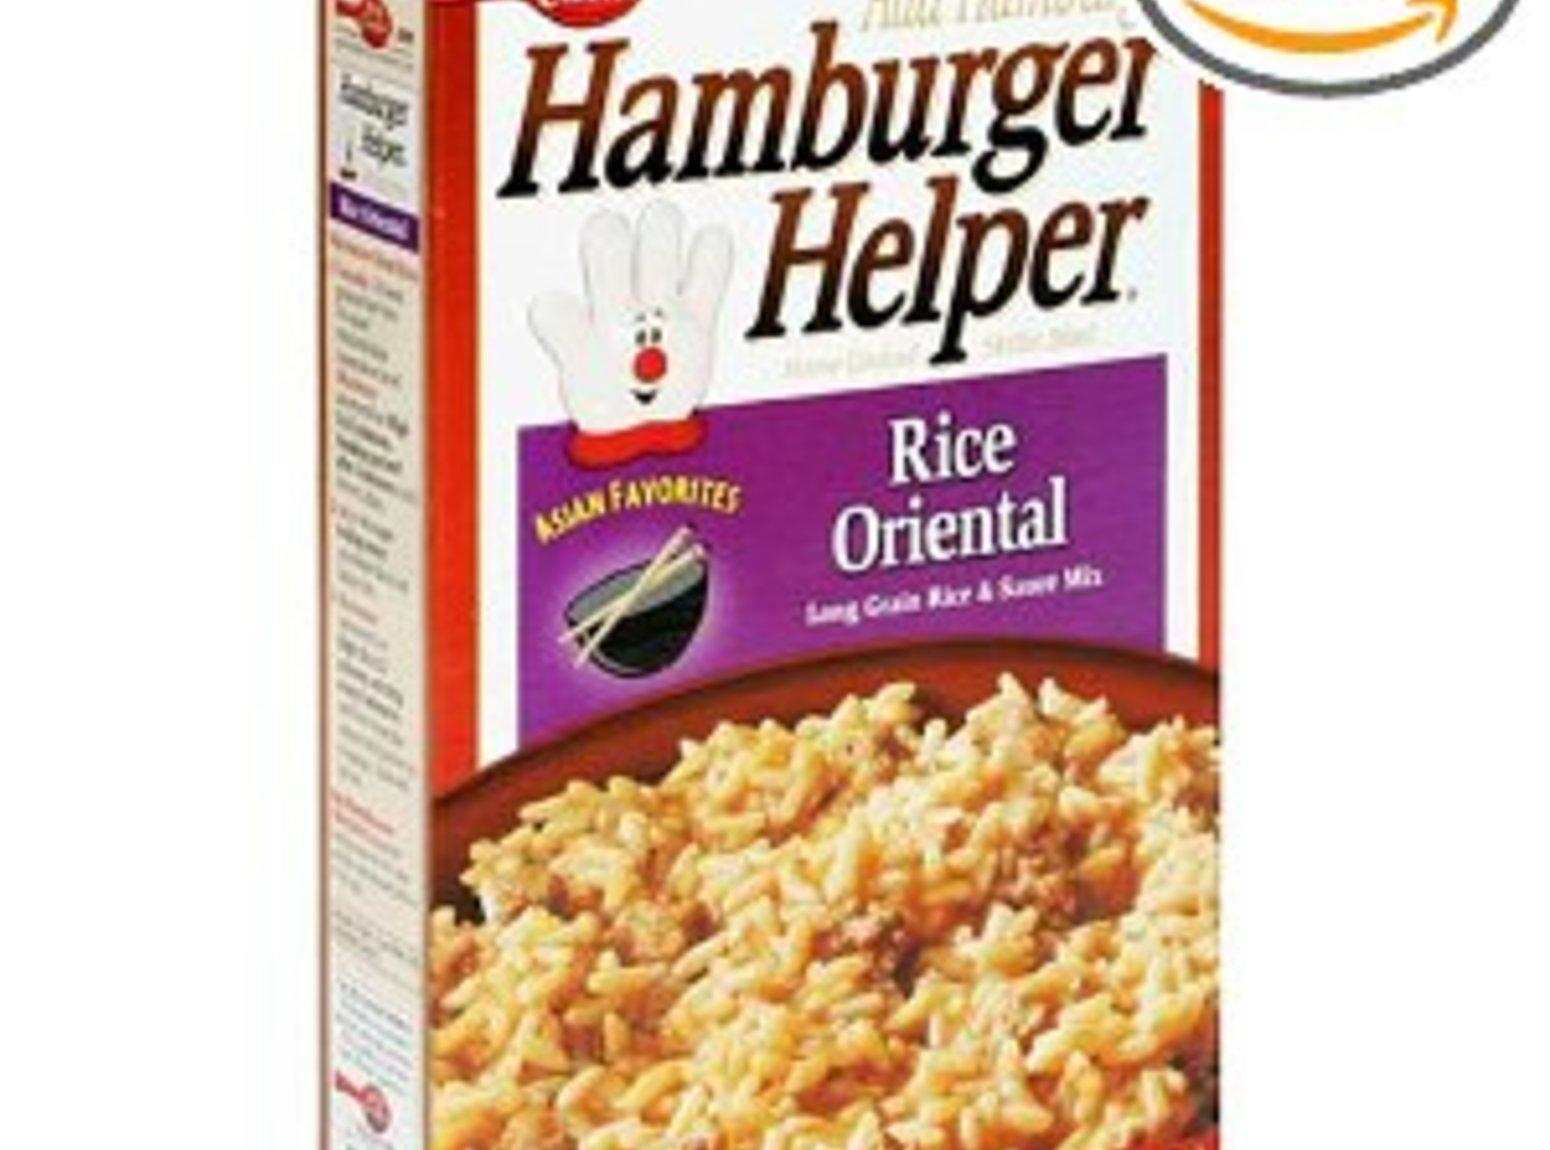 Rice Oriental (simlar to the Hamburger Helper) Recipe